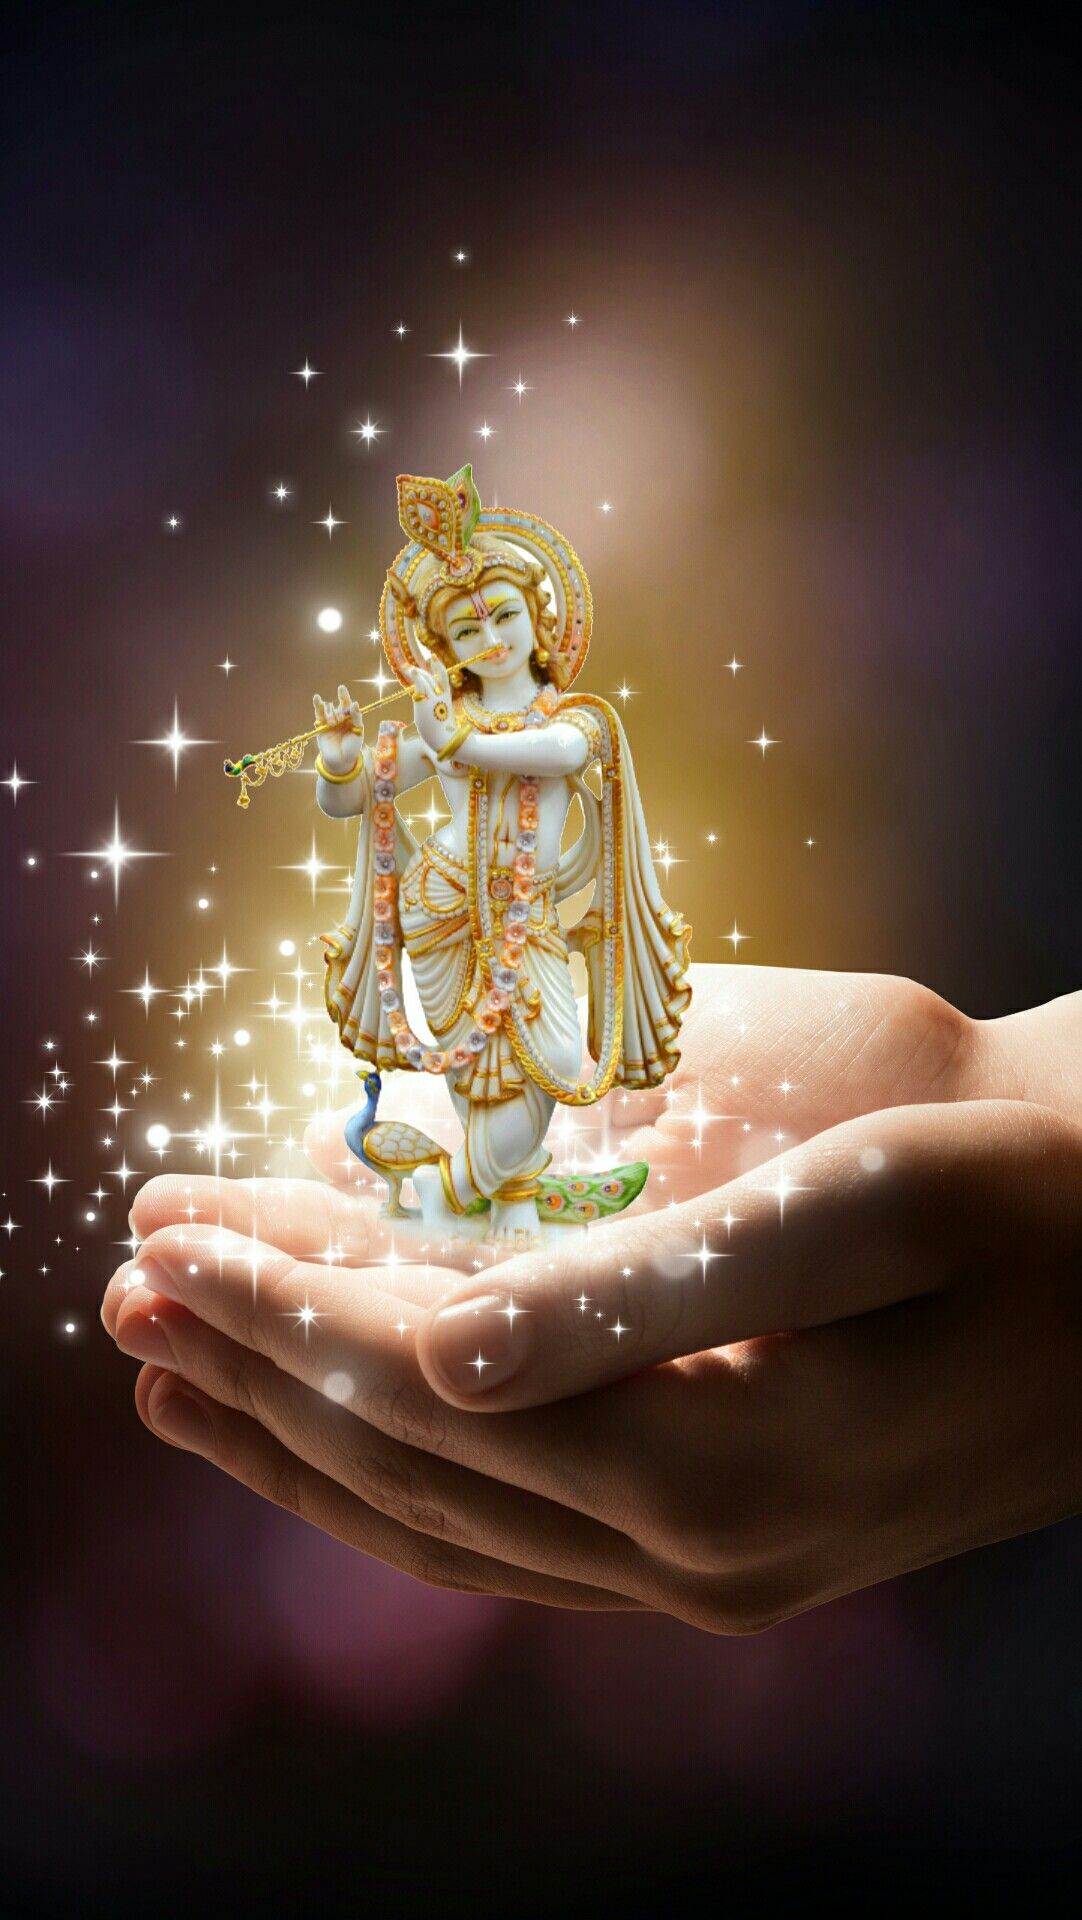 Pin By Rabi Barman On Hindu God Hindu Gods Cellphone Wallpaper Hindu